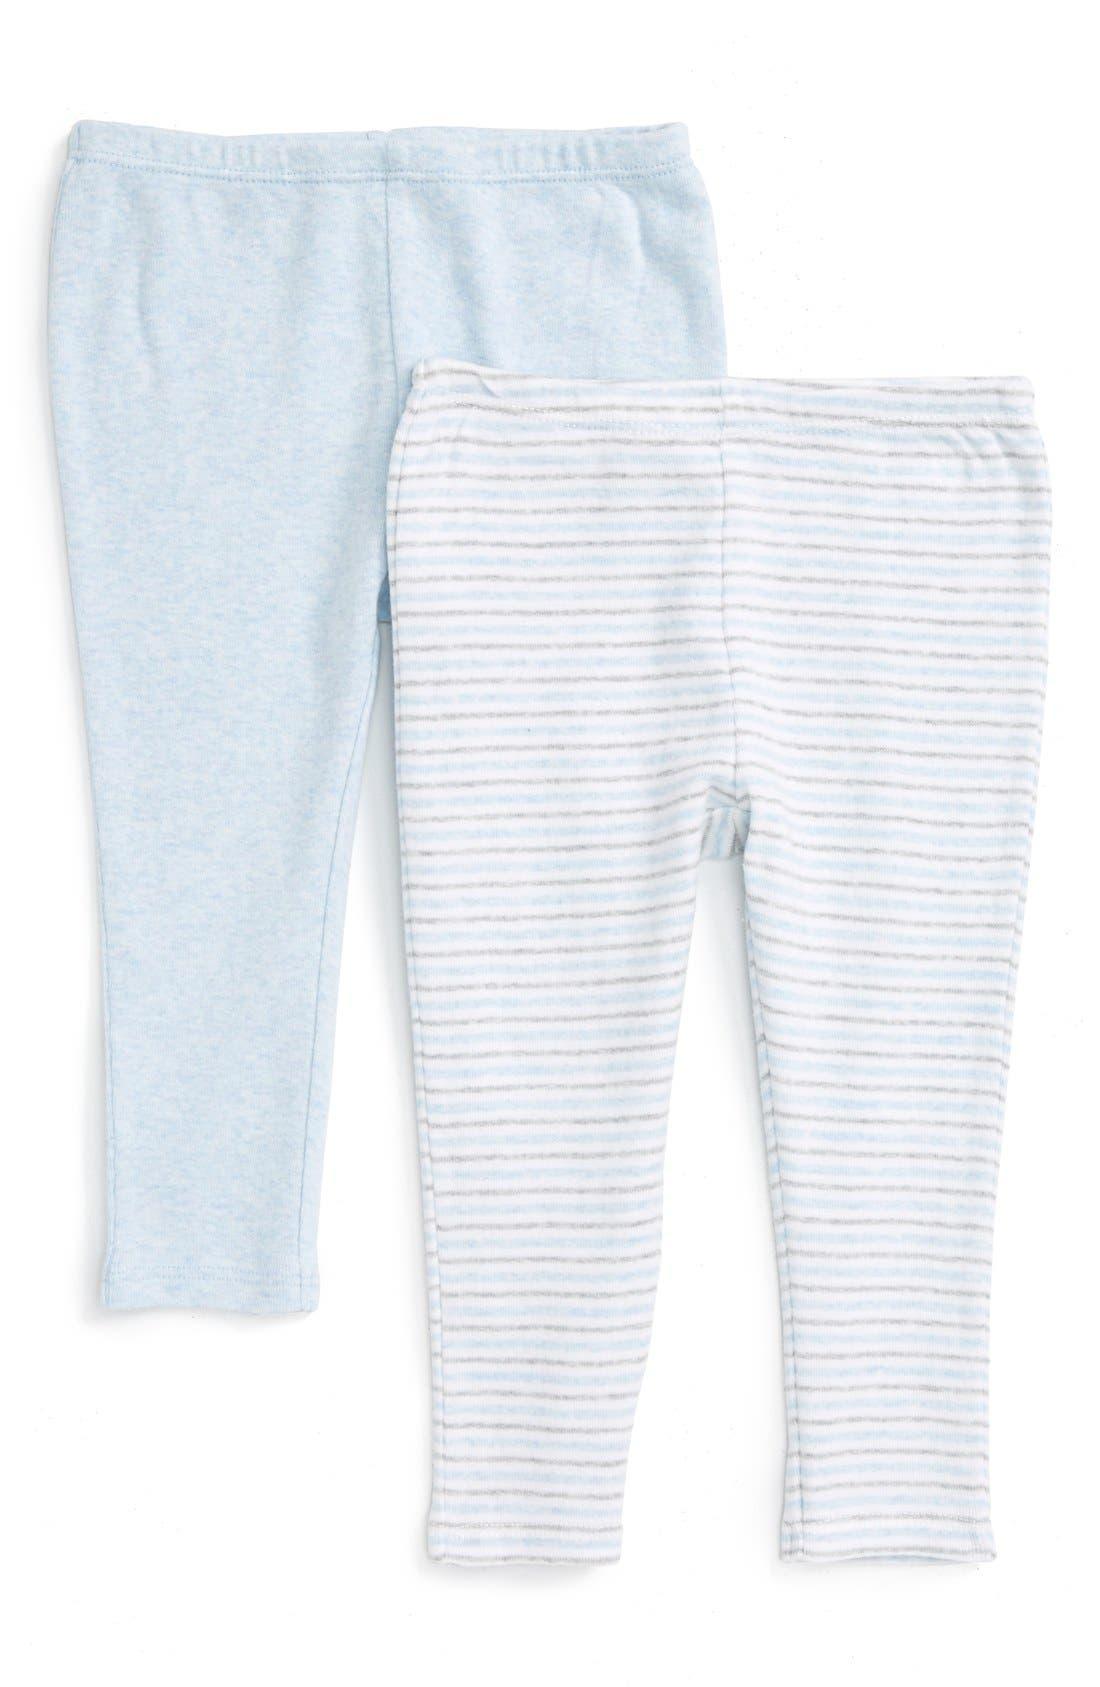 2-Pack Pants,                             Main thumbnail 1, color,                             BLUE PRECIOUS HEATHER PACK